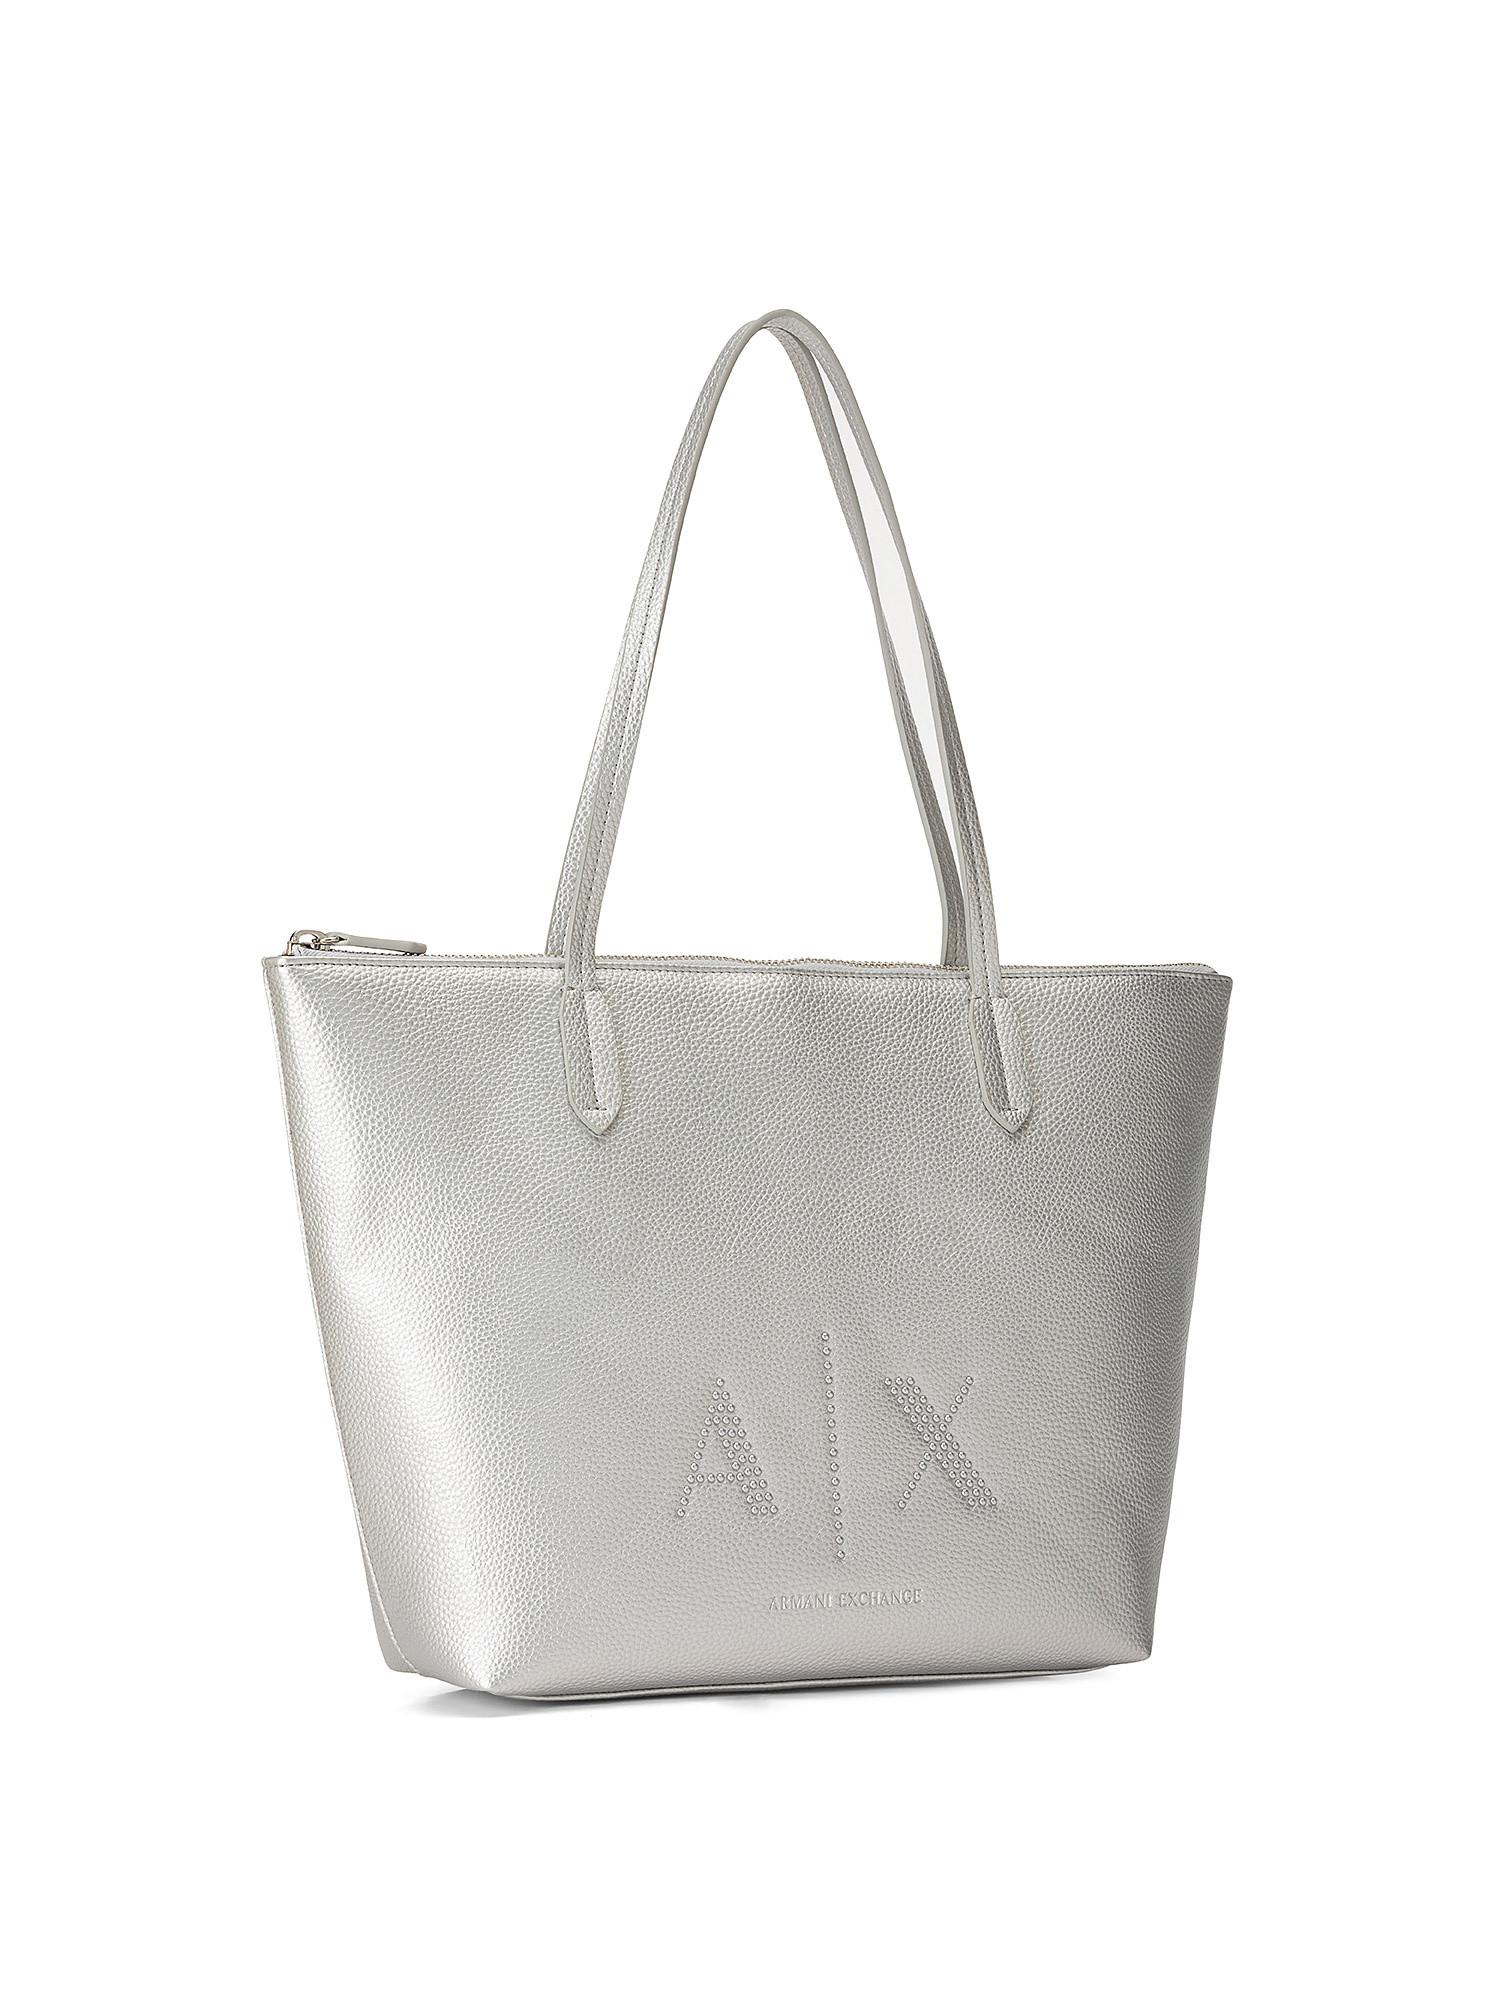 Shopper con borchiette applicate, Grigio argento, large image number 1